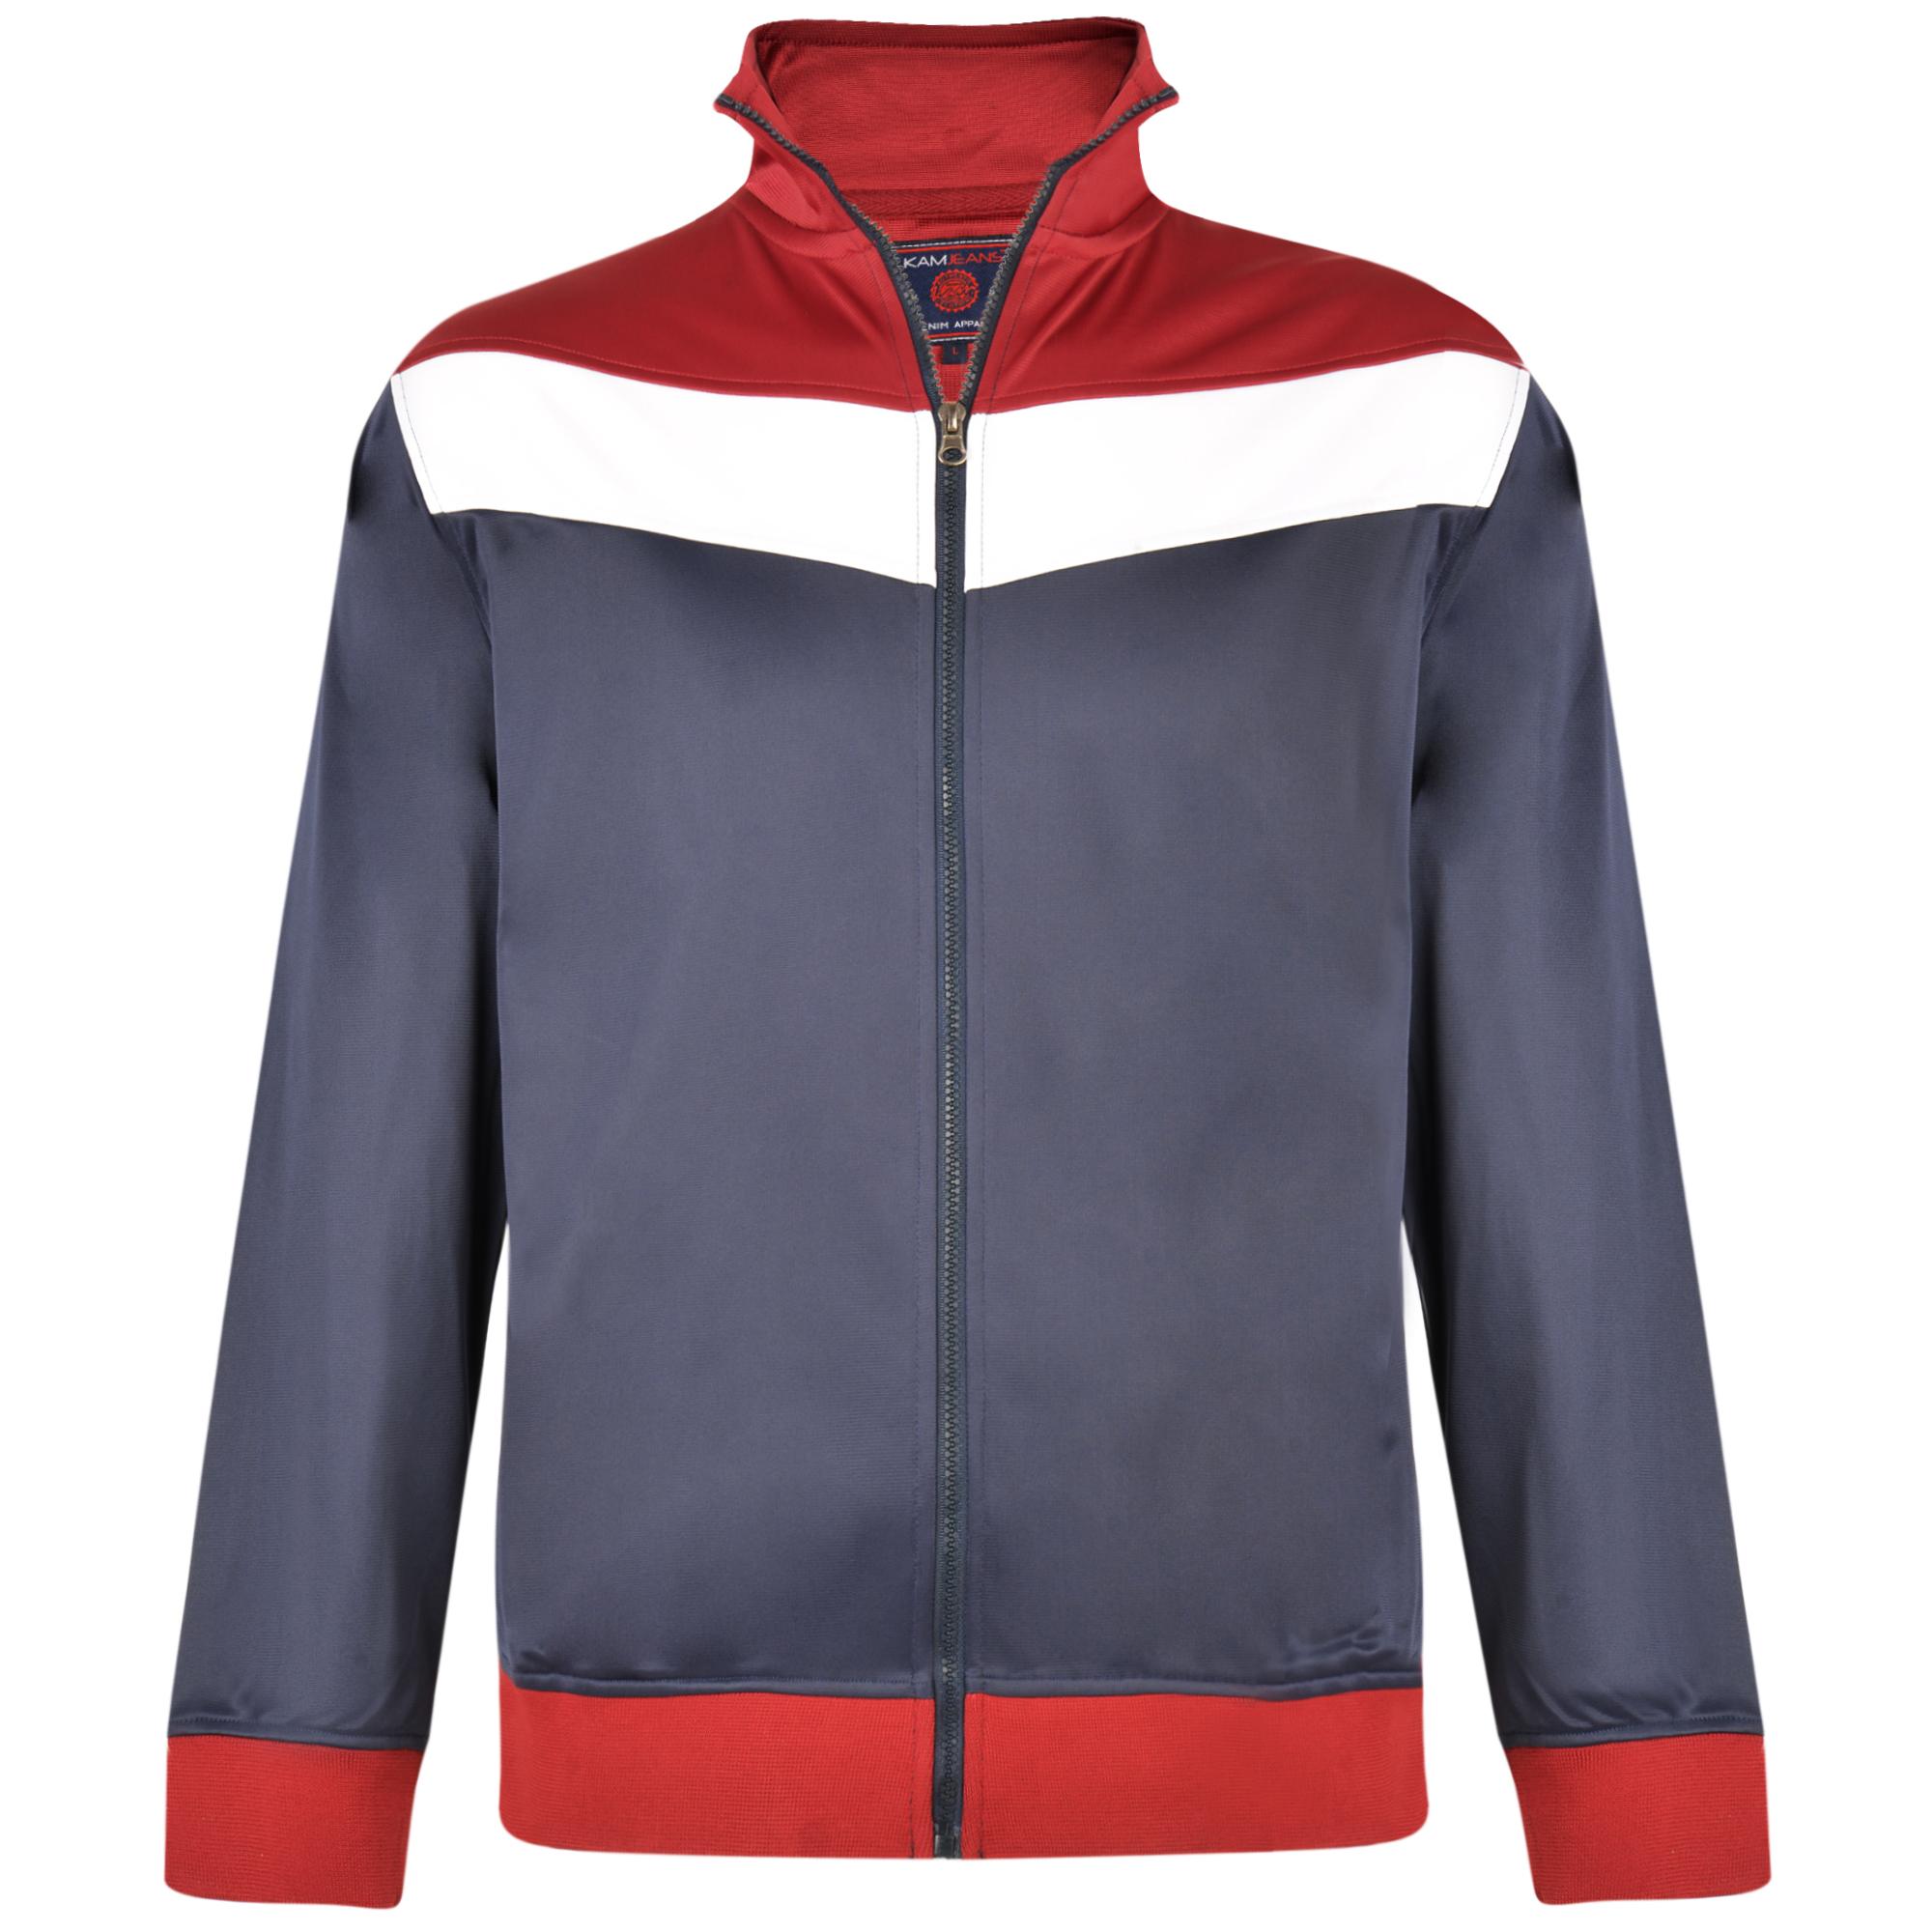 Tricot sport top van merk KAM Jeanswear in de kleur navy, gemaakt van polyester.